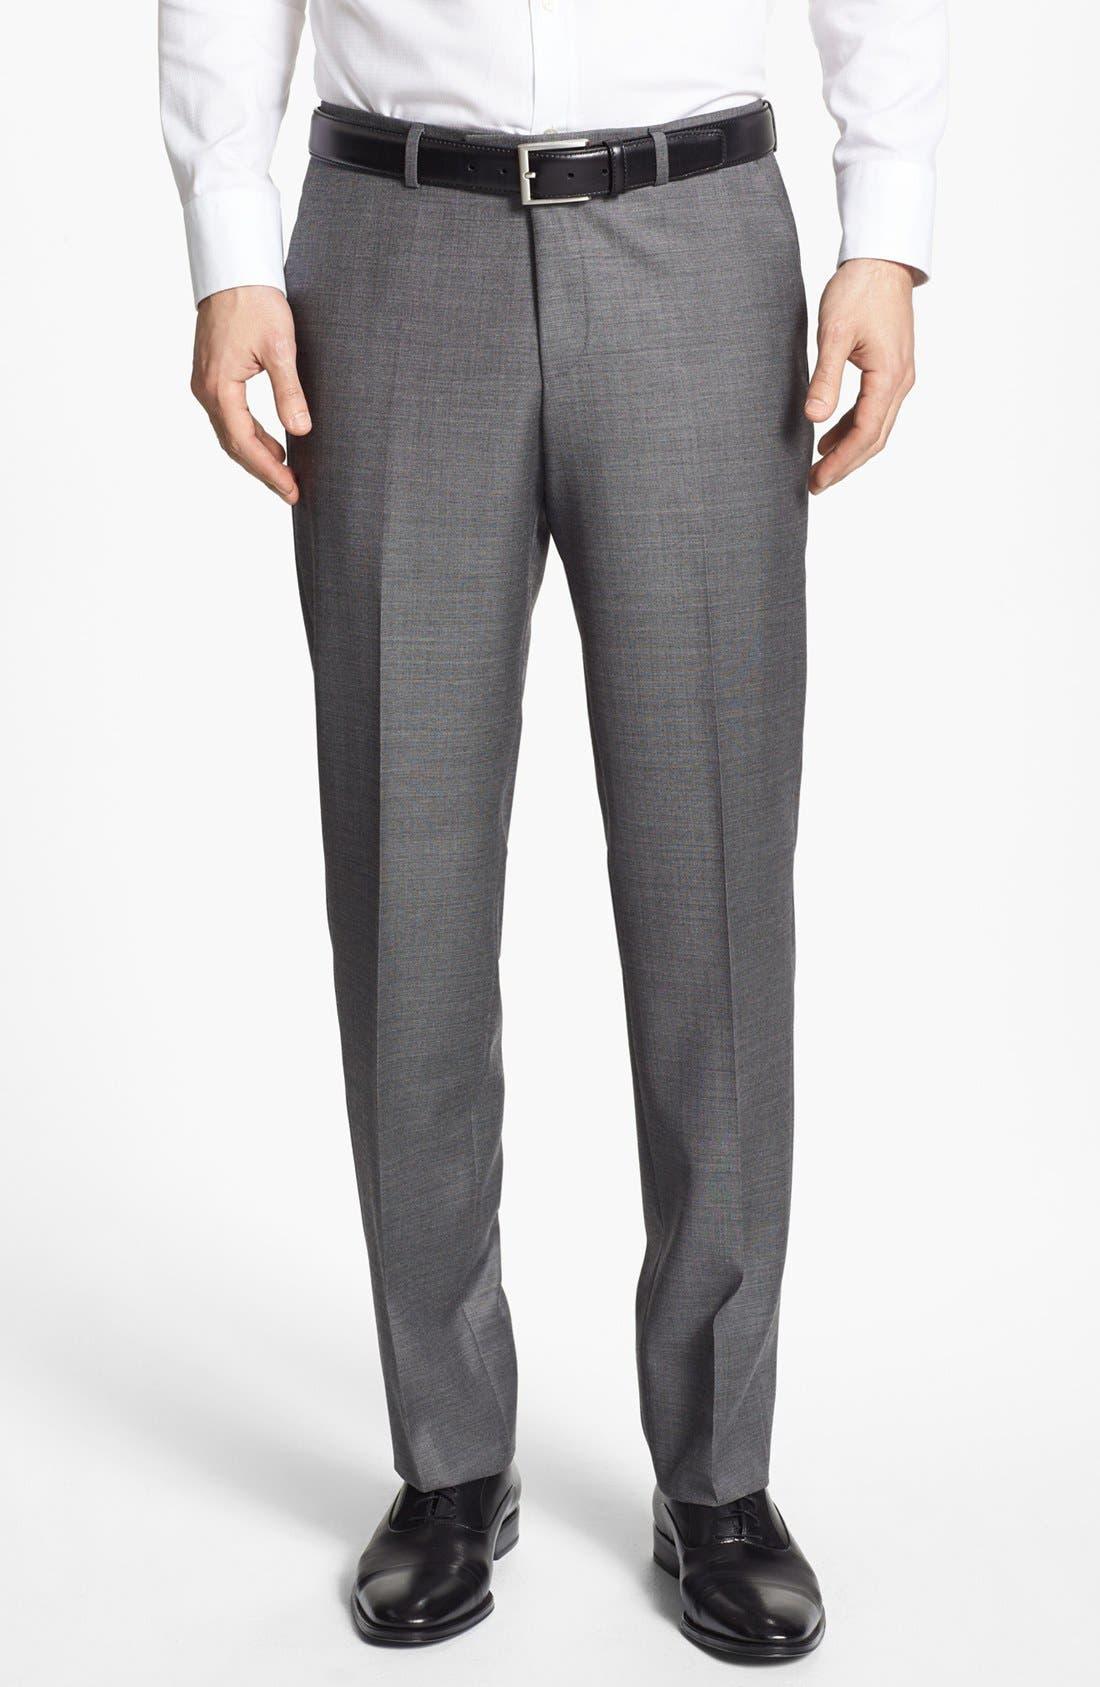 ZZDNUHUGO BOSS,                             BOSS HUGO BOSS 'Sharp' Flat Front Wool Trousers,                             Main thumbnail 1, color,                             001